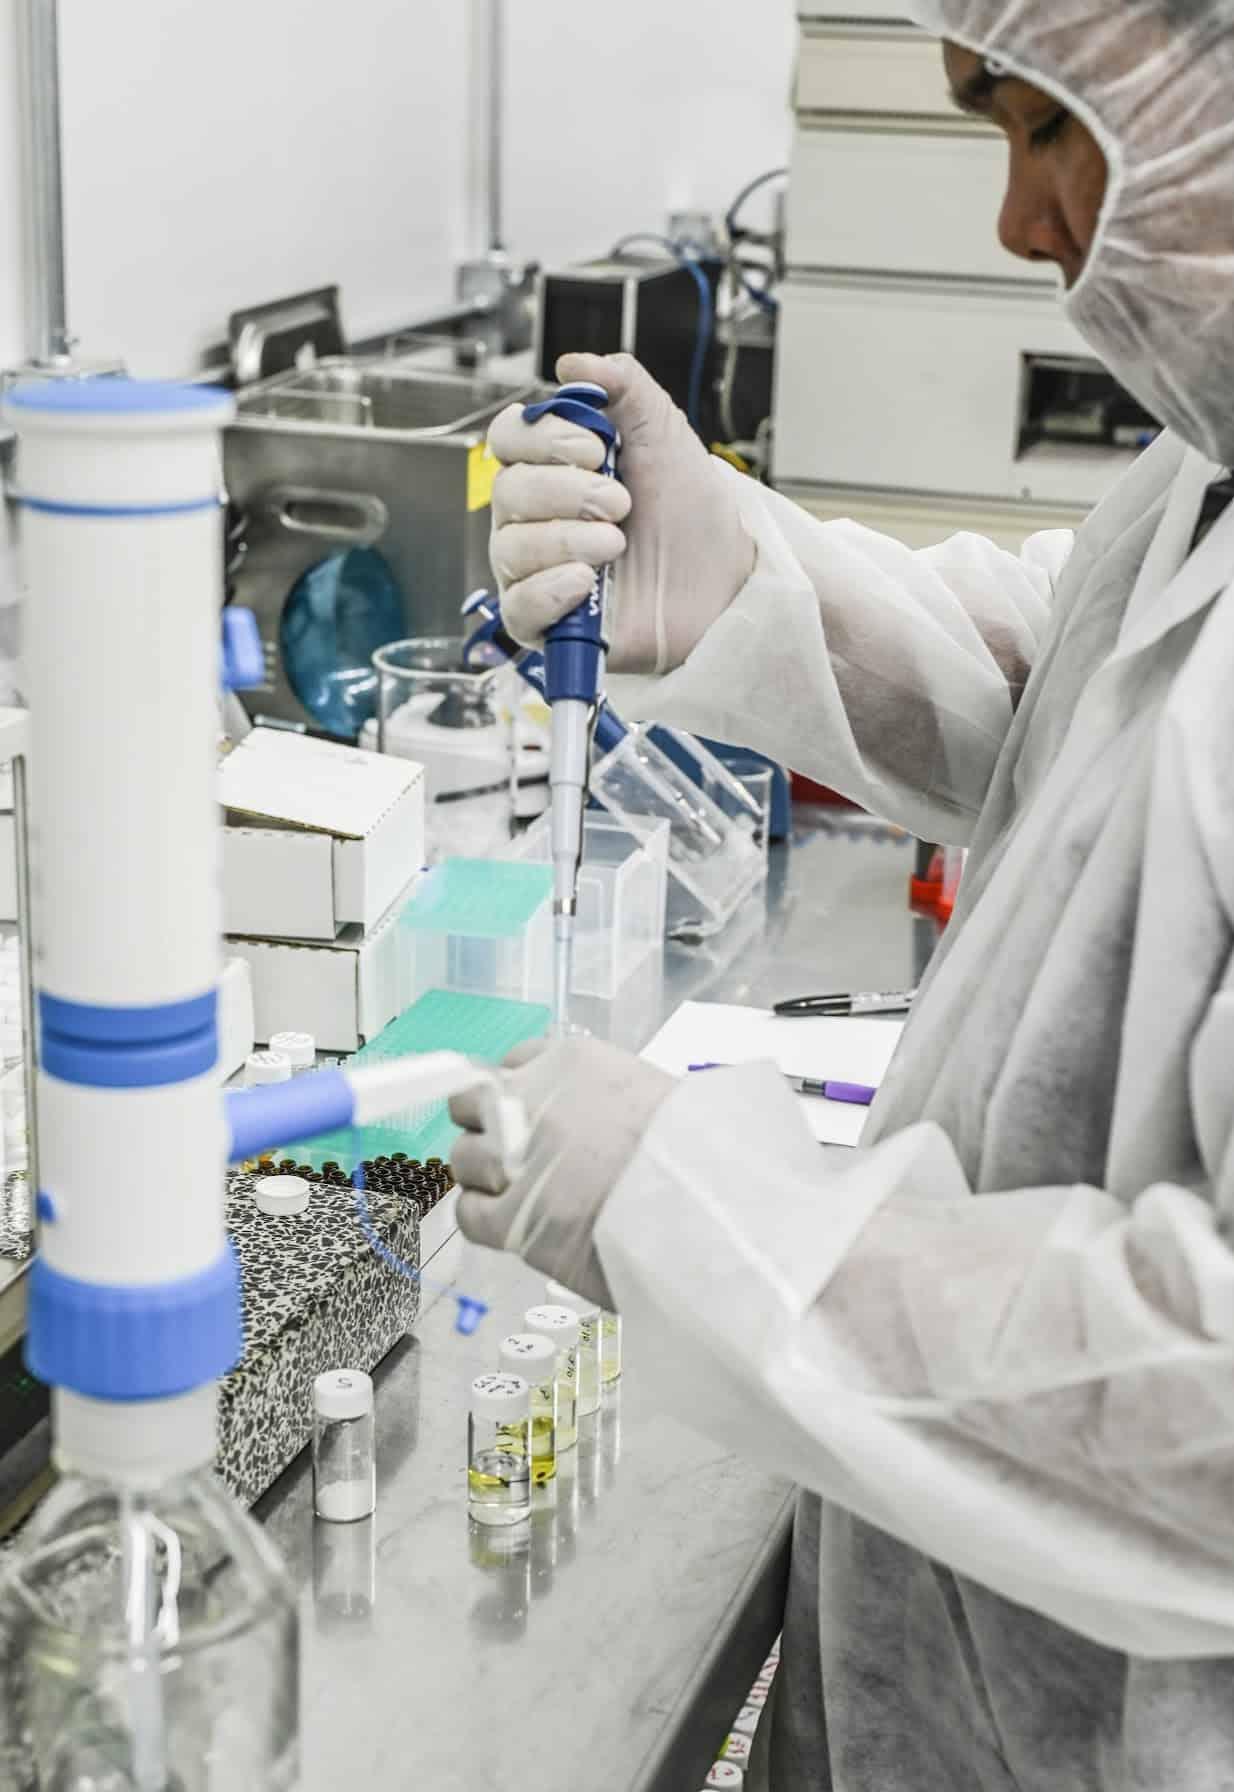 scientist using chromatography equipment